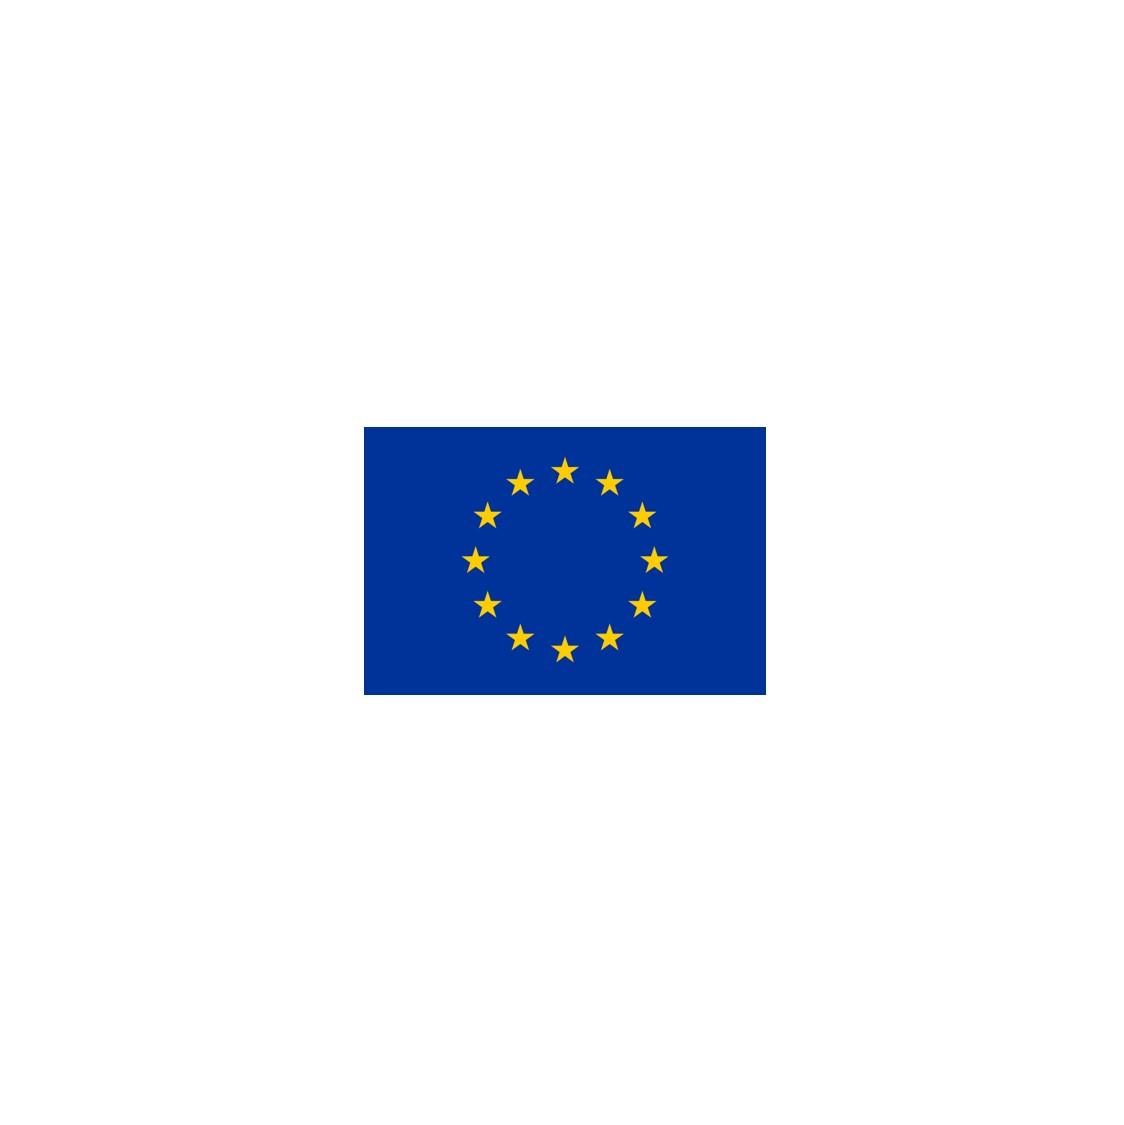 RI_149_EU_PLATONE-q2.jpg